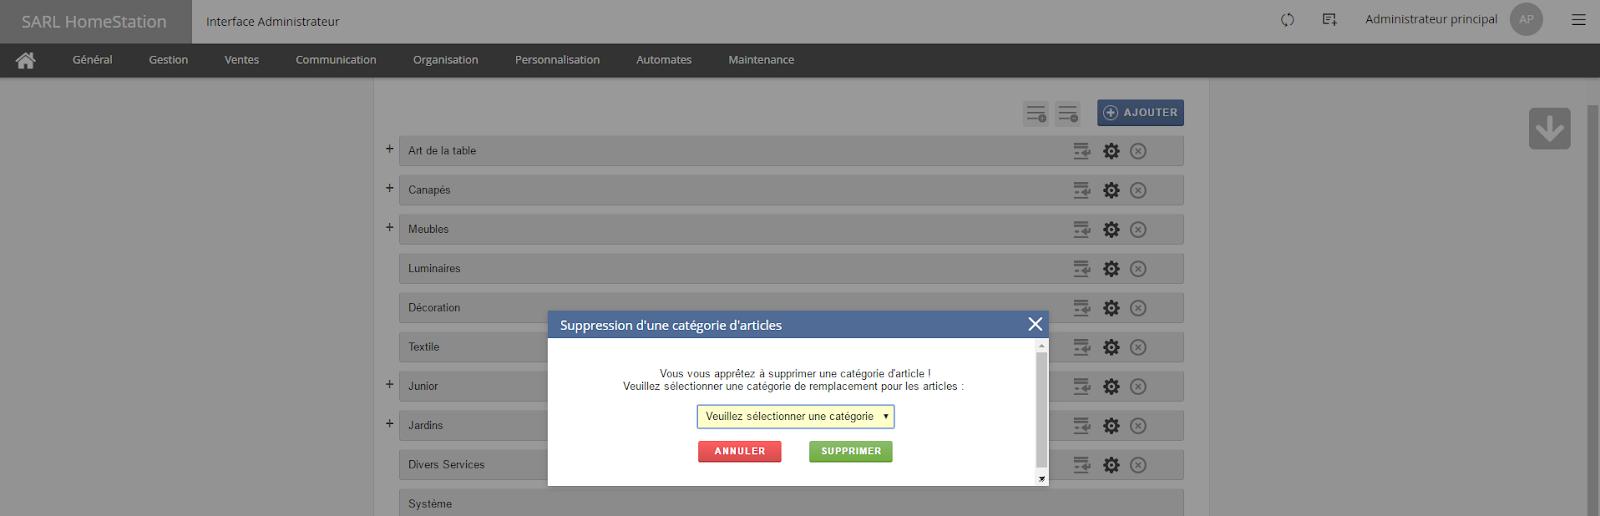 Suppression_categ.png